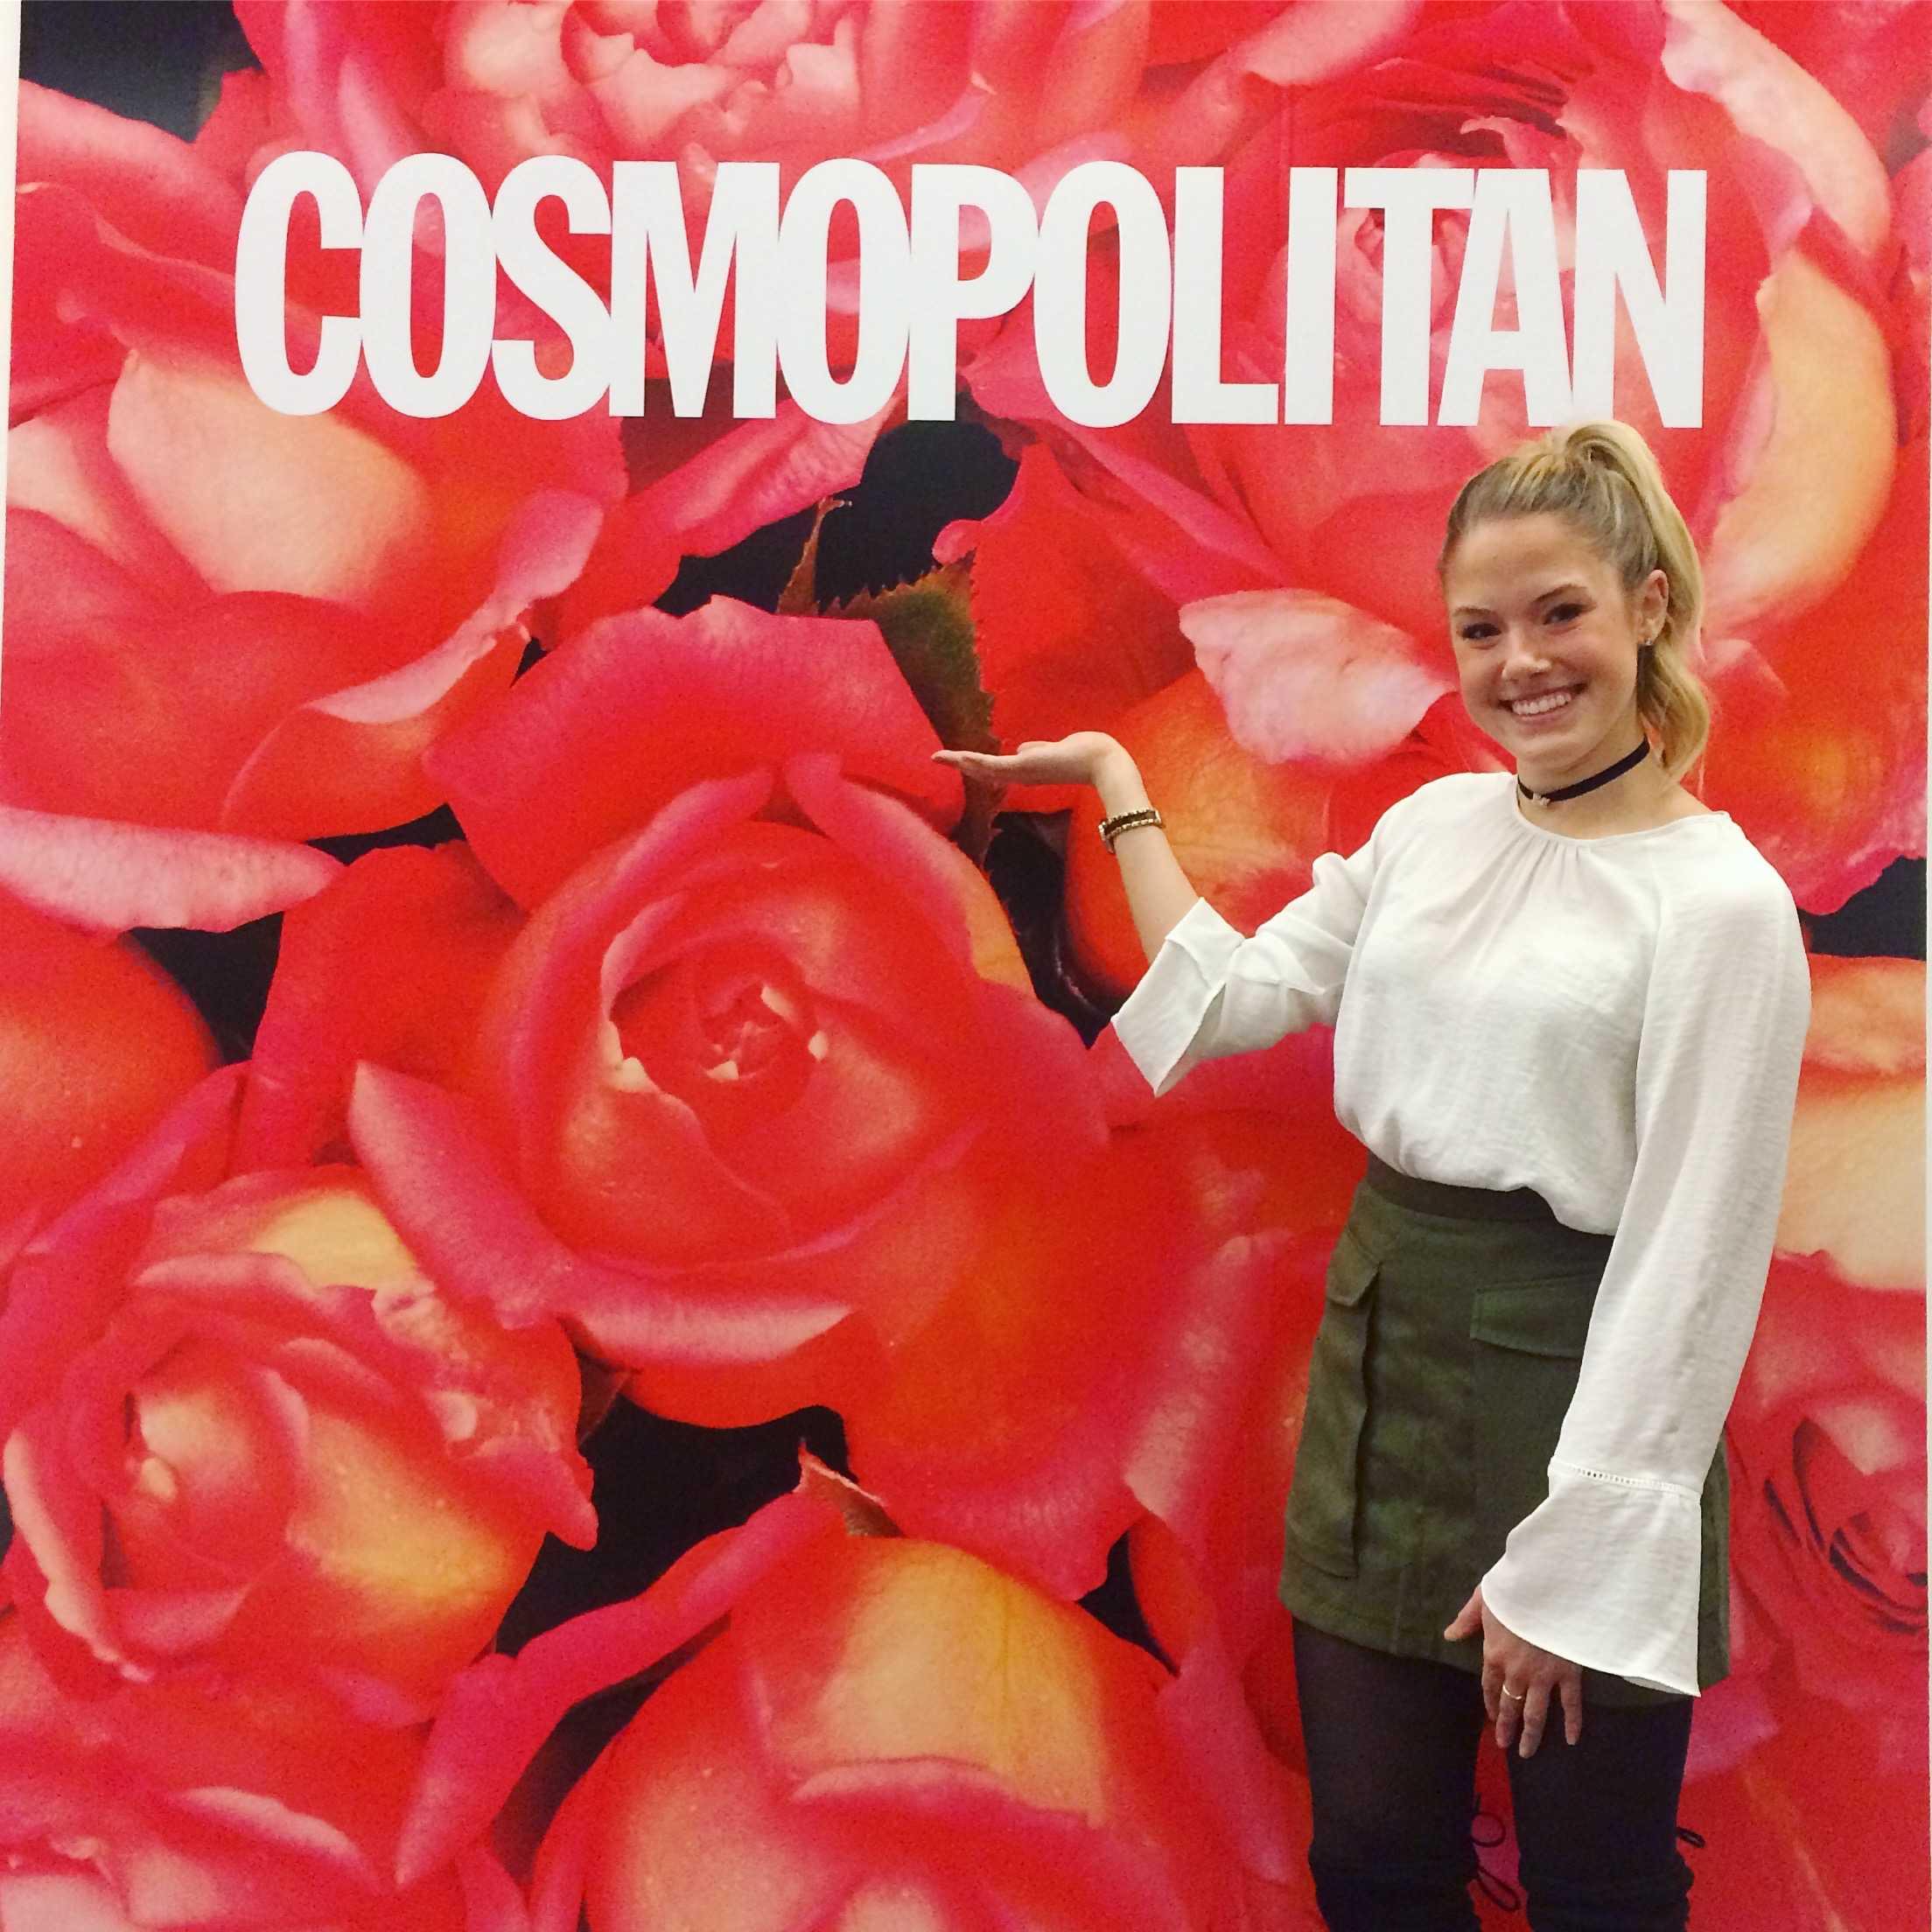 Madeline Galassi spent the semester interning at Cosmopolitan in New York City.